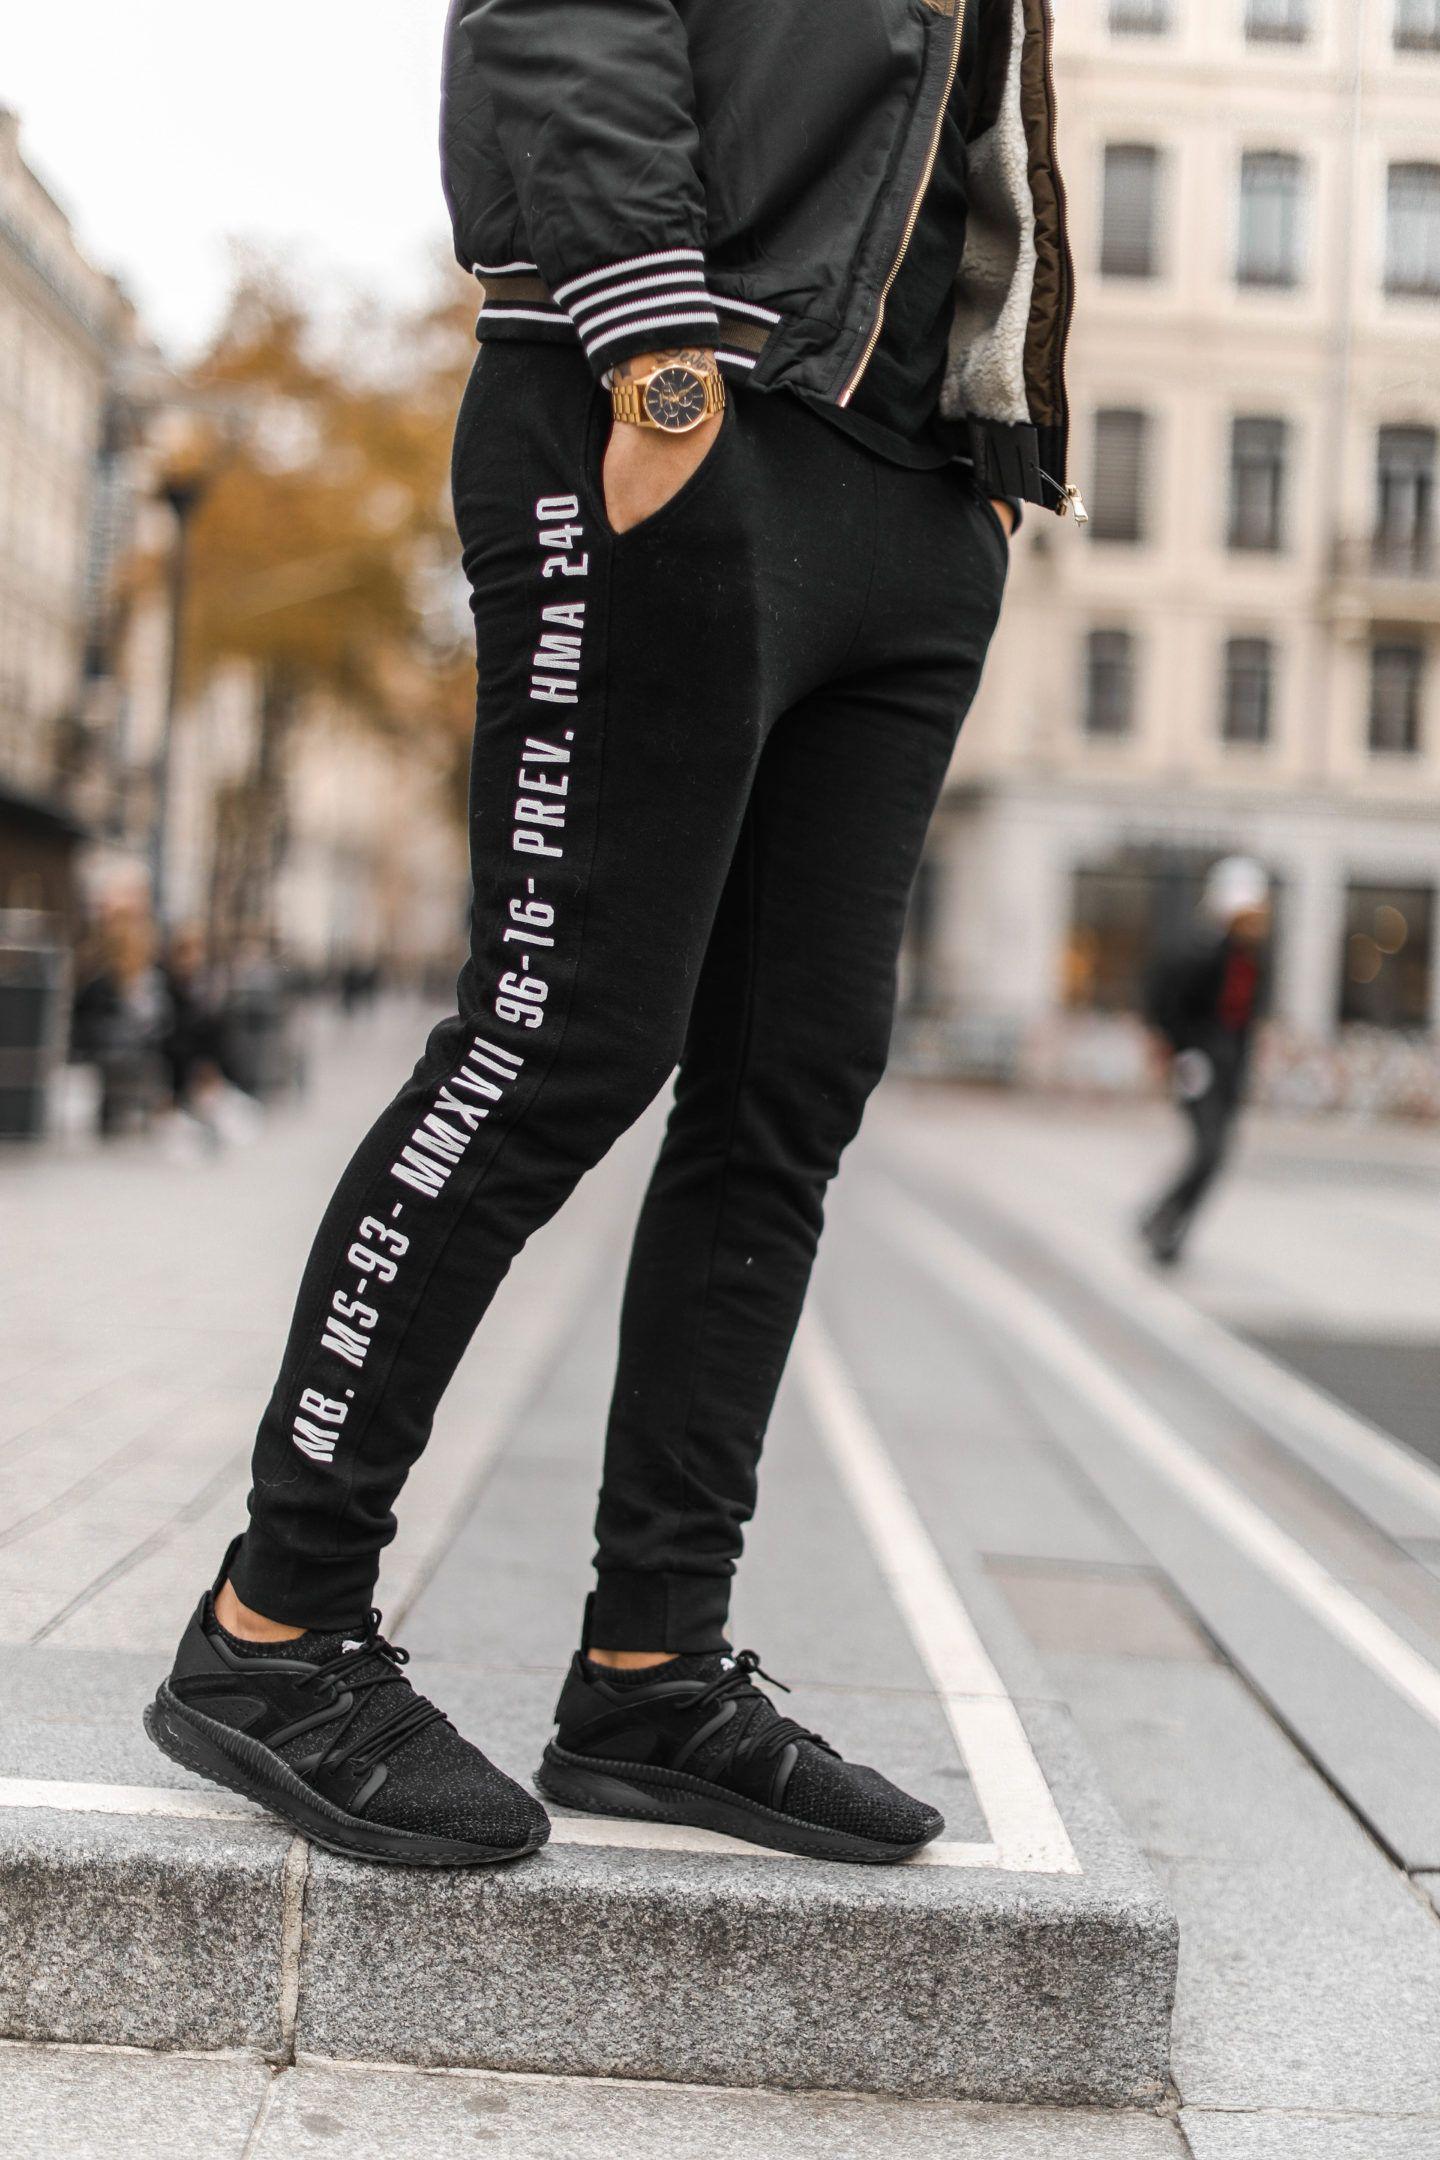 huge discount 0362a 3340b Puma homme all black Mens Jogger Pants, Sport Pants, Sporty Trends, Boys  Jeans